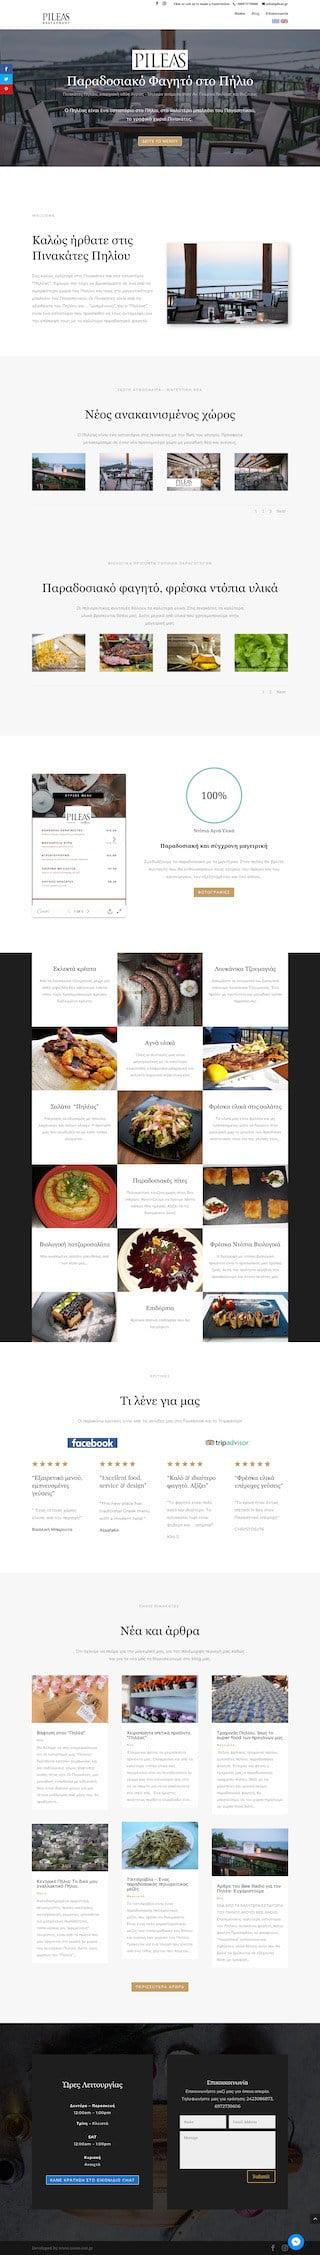 restaurant home page layout demo ιστοσελιδα εστιατορίου αρχική σελίδα